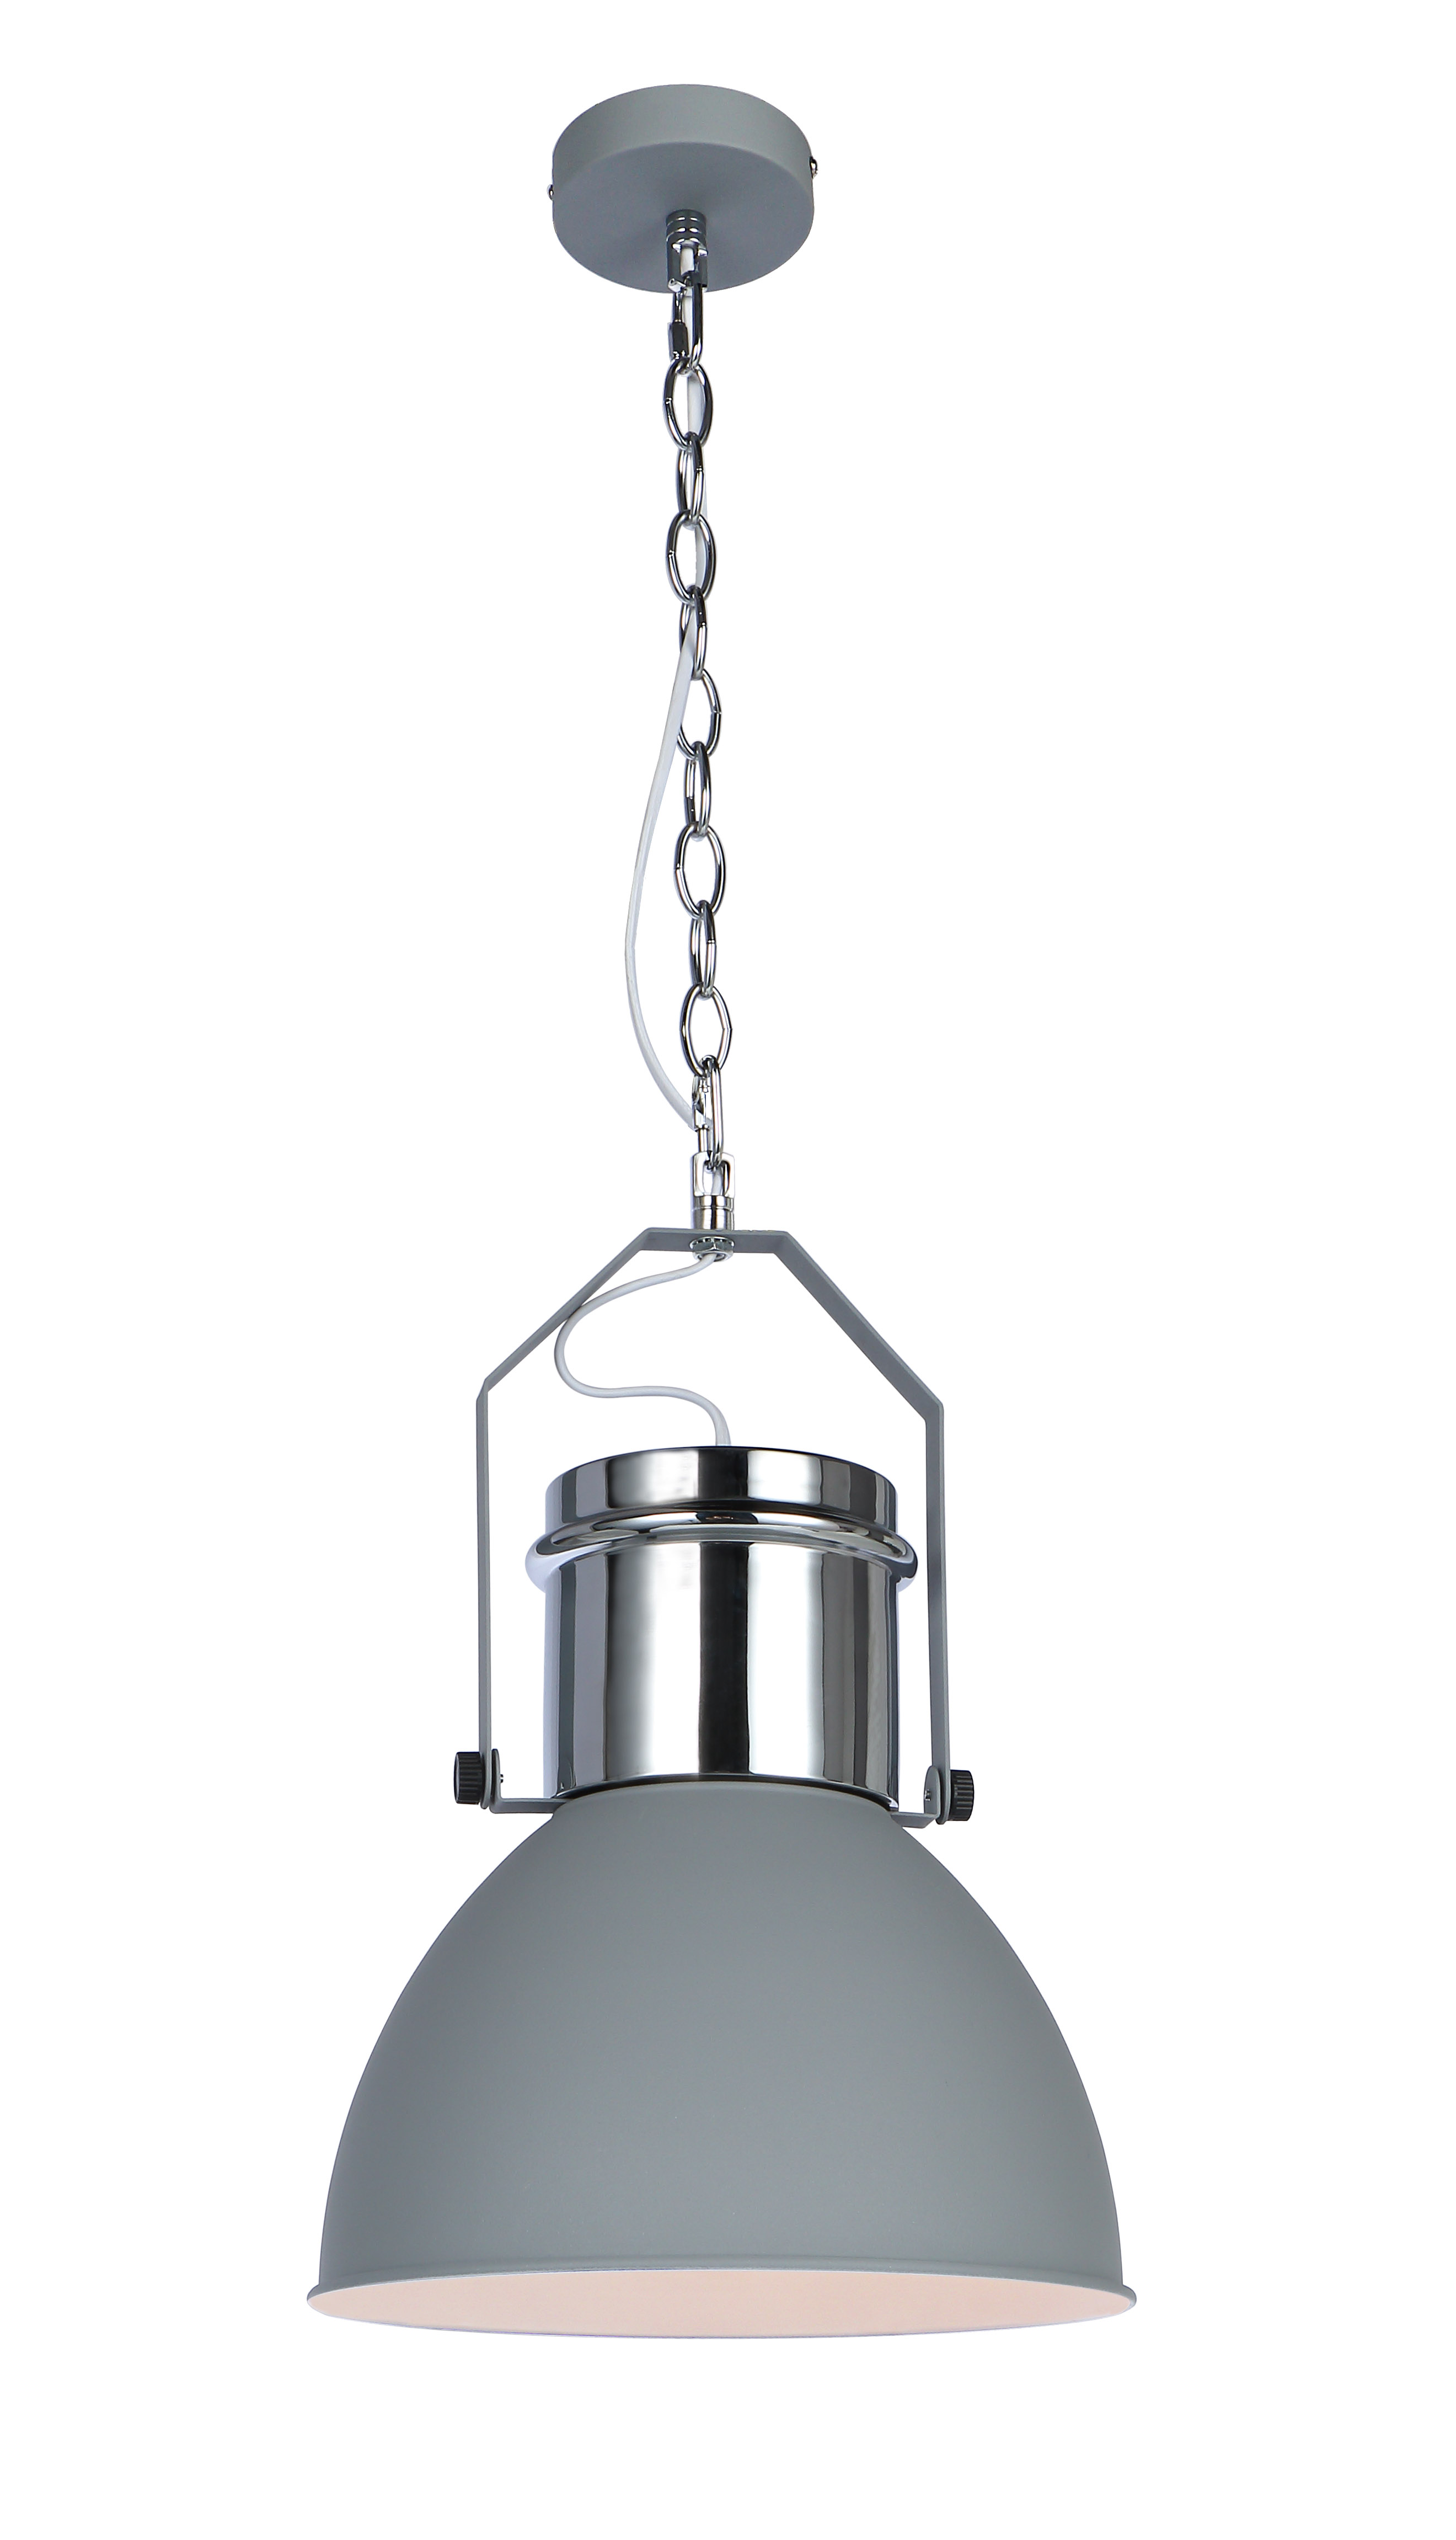 kutum schlafzimmer r ume produkte globo lighting leuchten lampen online kaufen. Black Bedroom Furniture Sets. Home Design Ideas